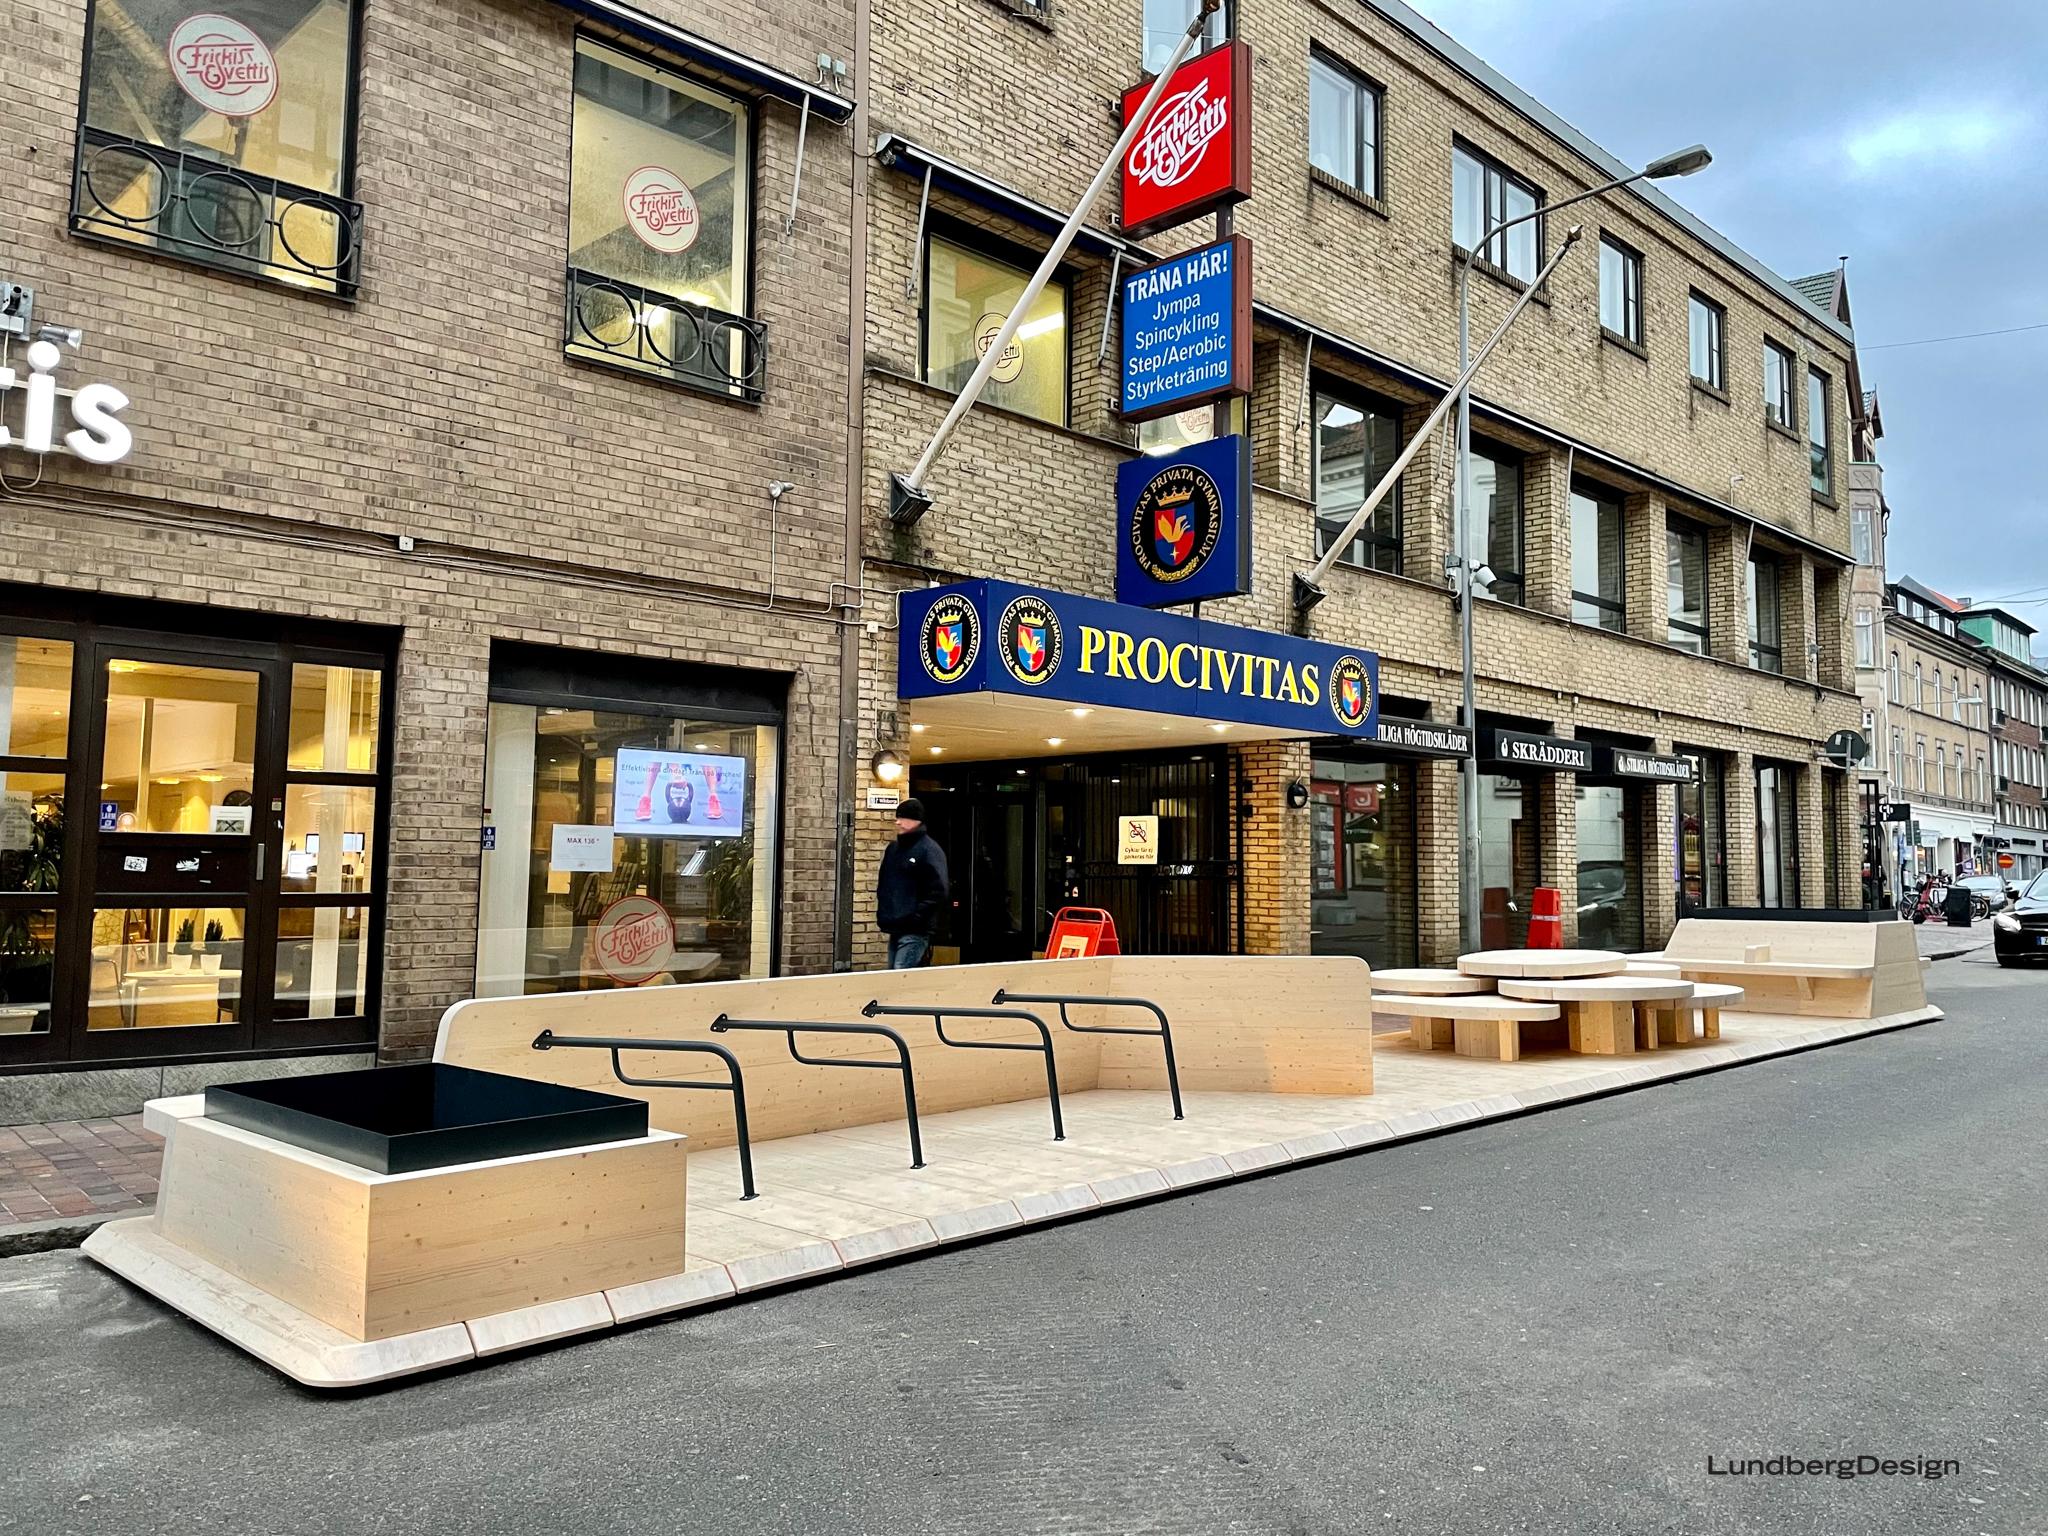 Street Moves - LundbergDesign - Parklet